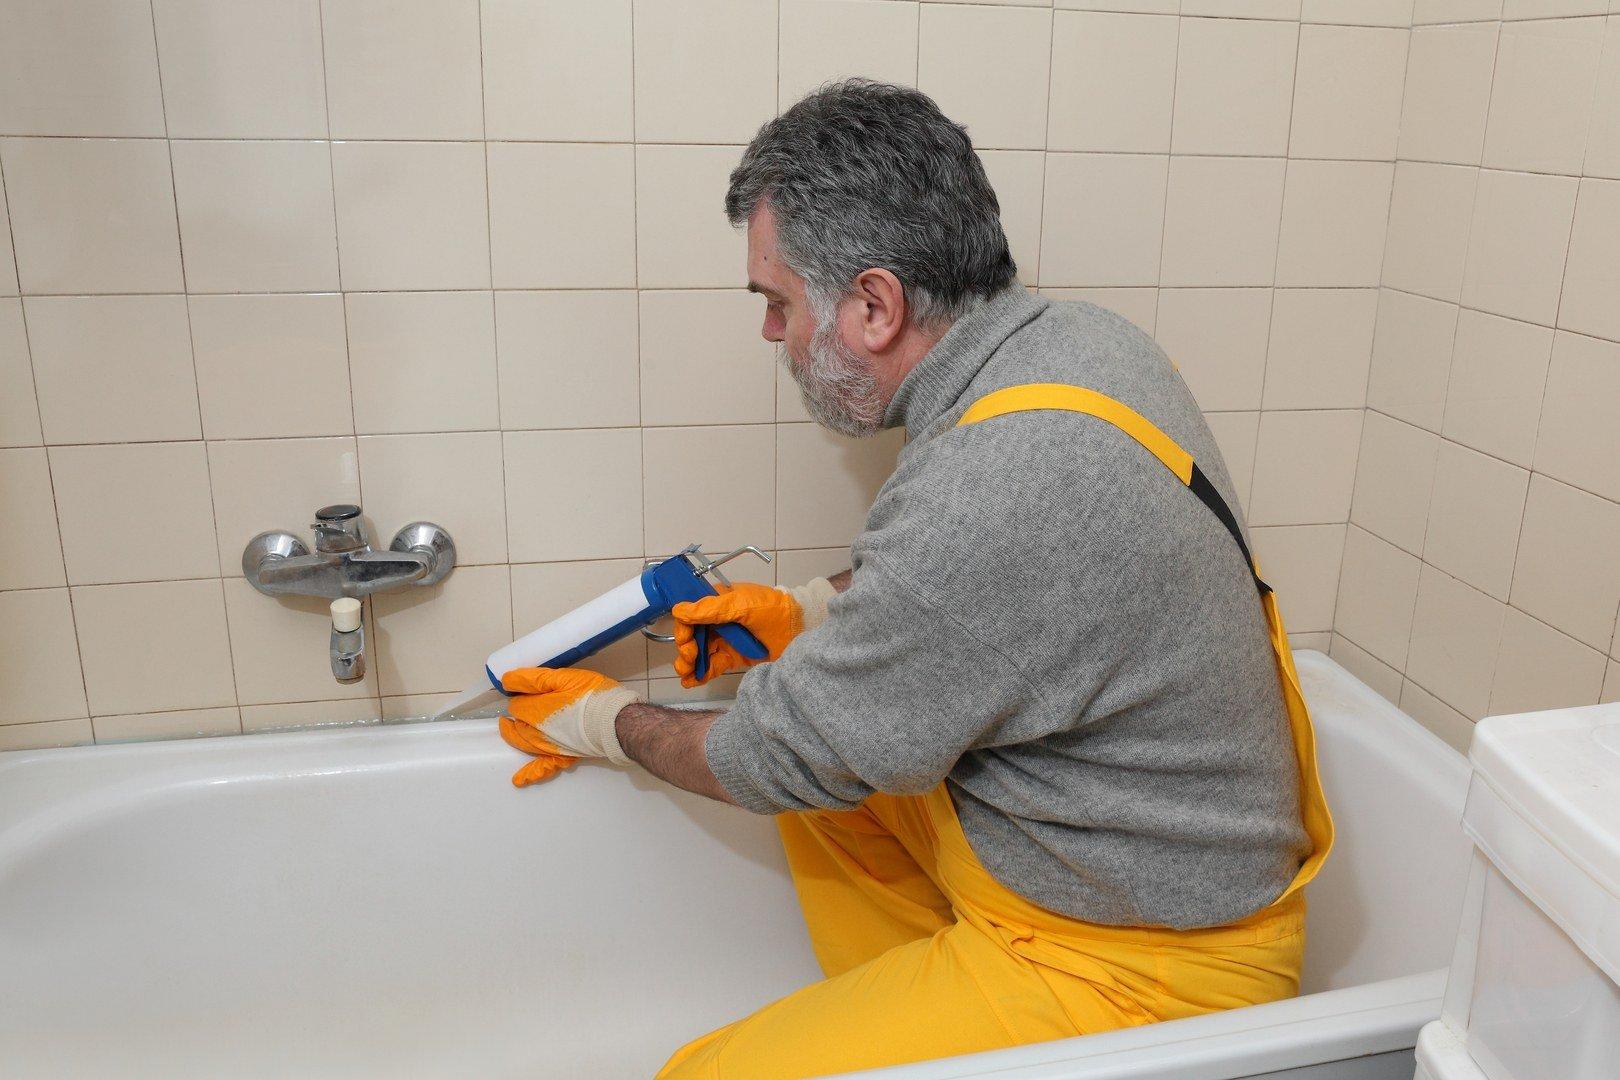 Bathtub Repair & Plumbing Orange County - Shower Repair Services ...